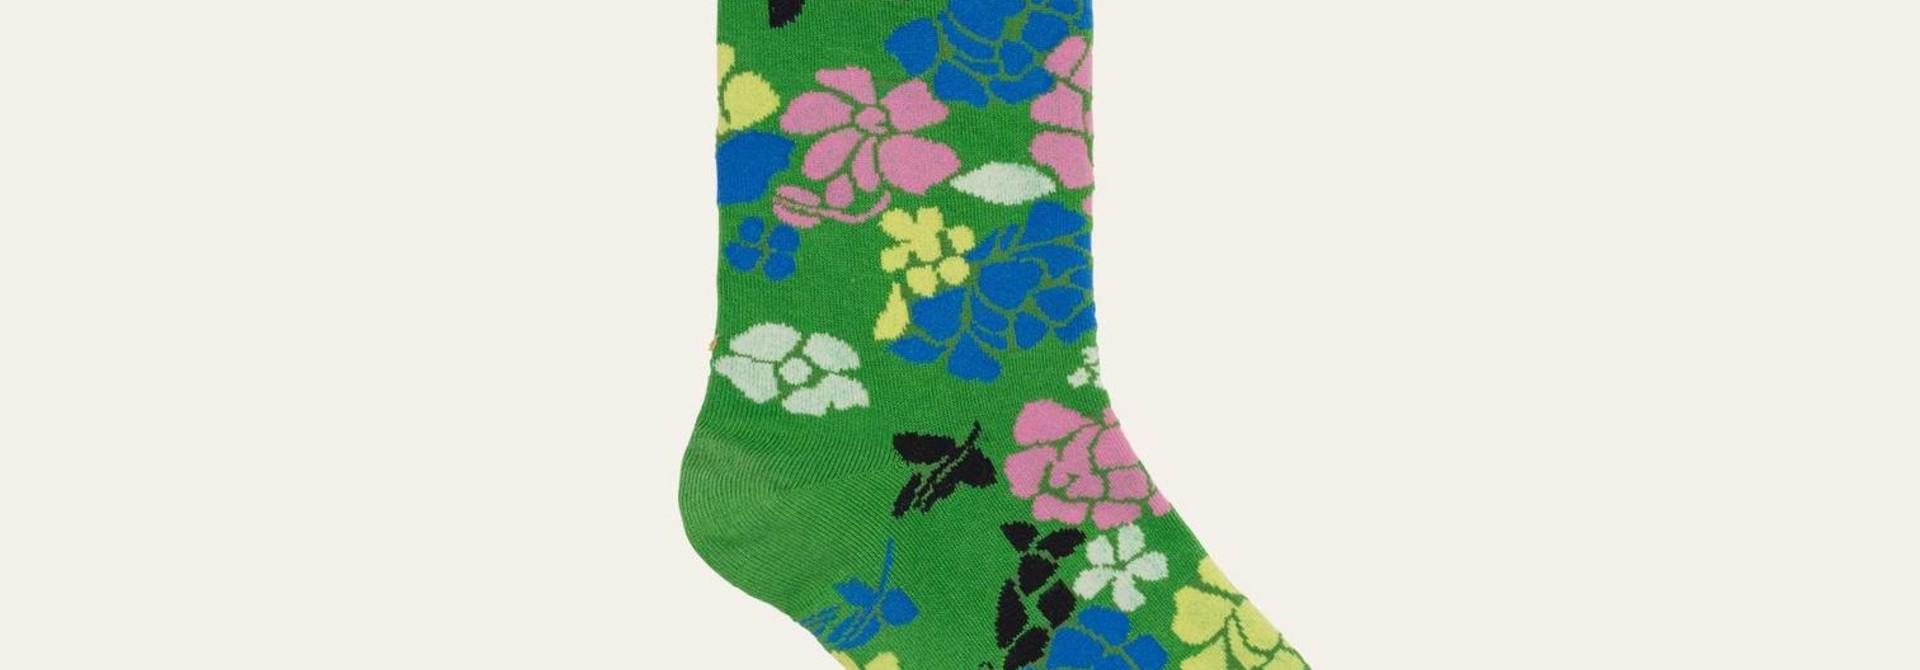 Caty socks Banan leaf